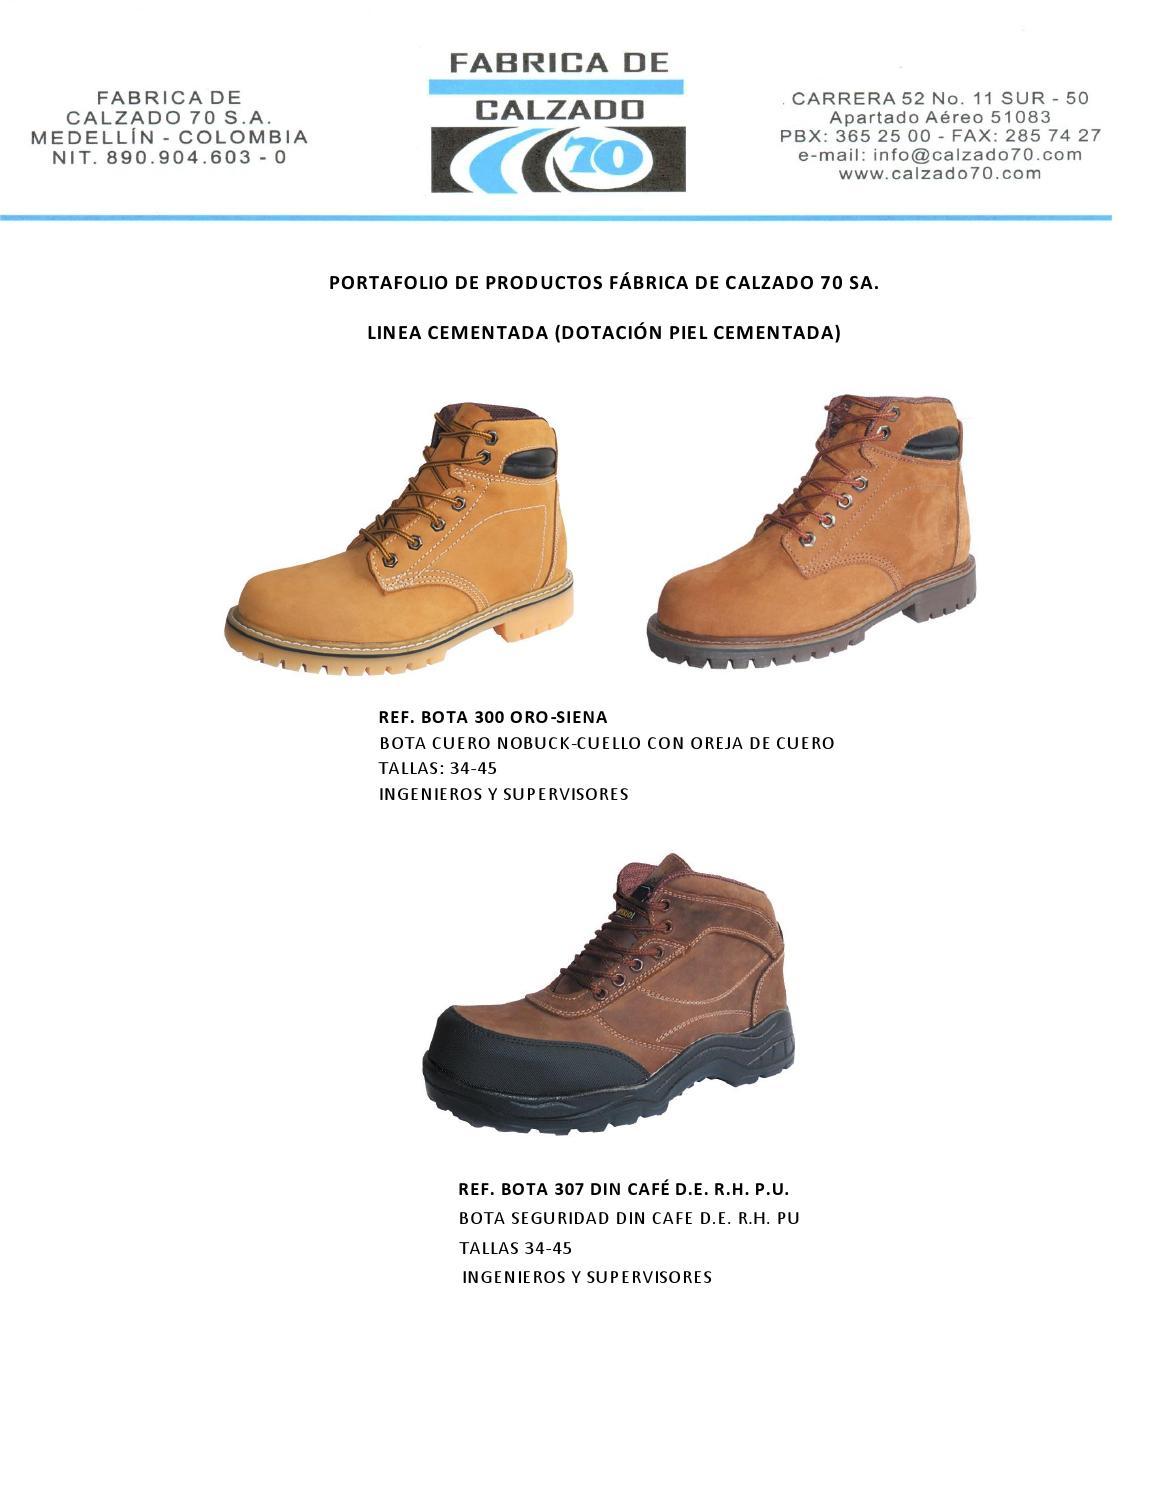 Sildenafil uk boots.doc - Calzado_70_cementado_vulcanizado 2 Years Ago Juancamiloserna